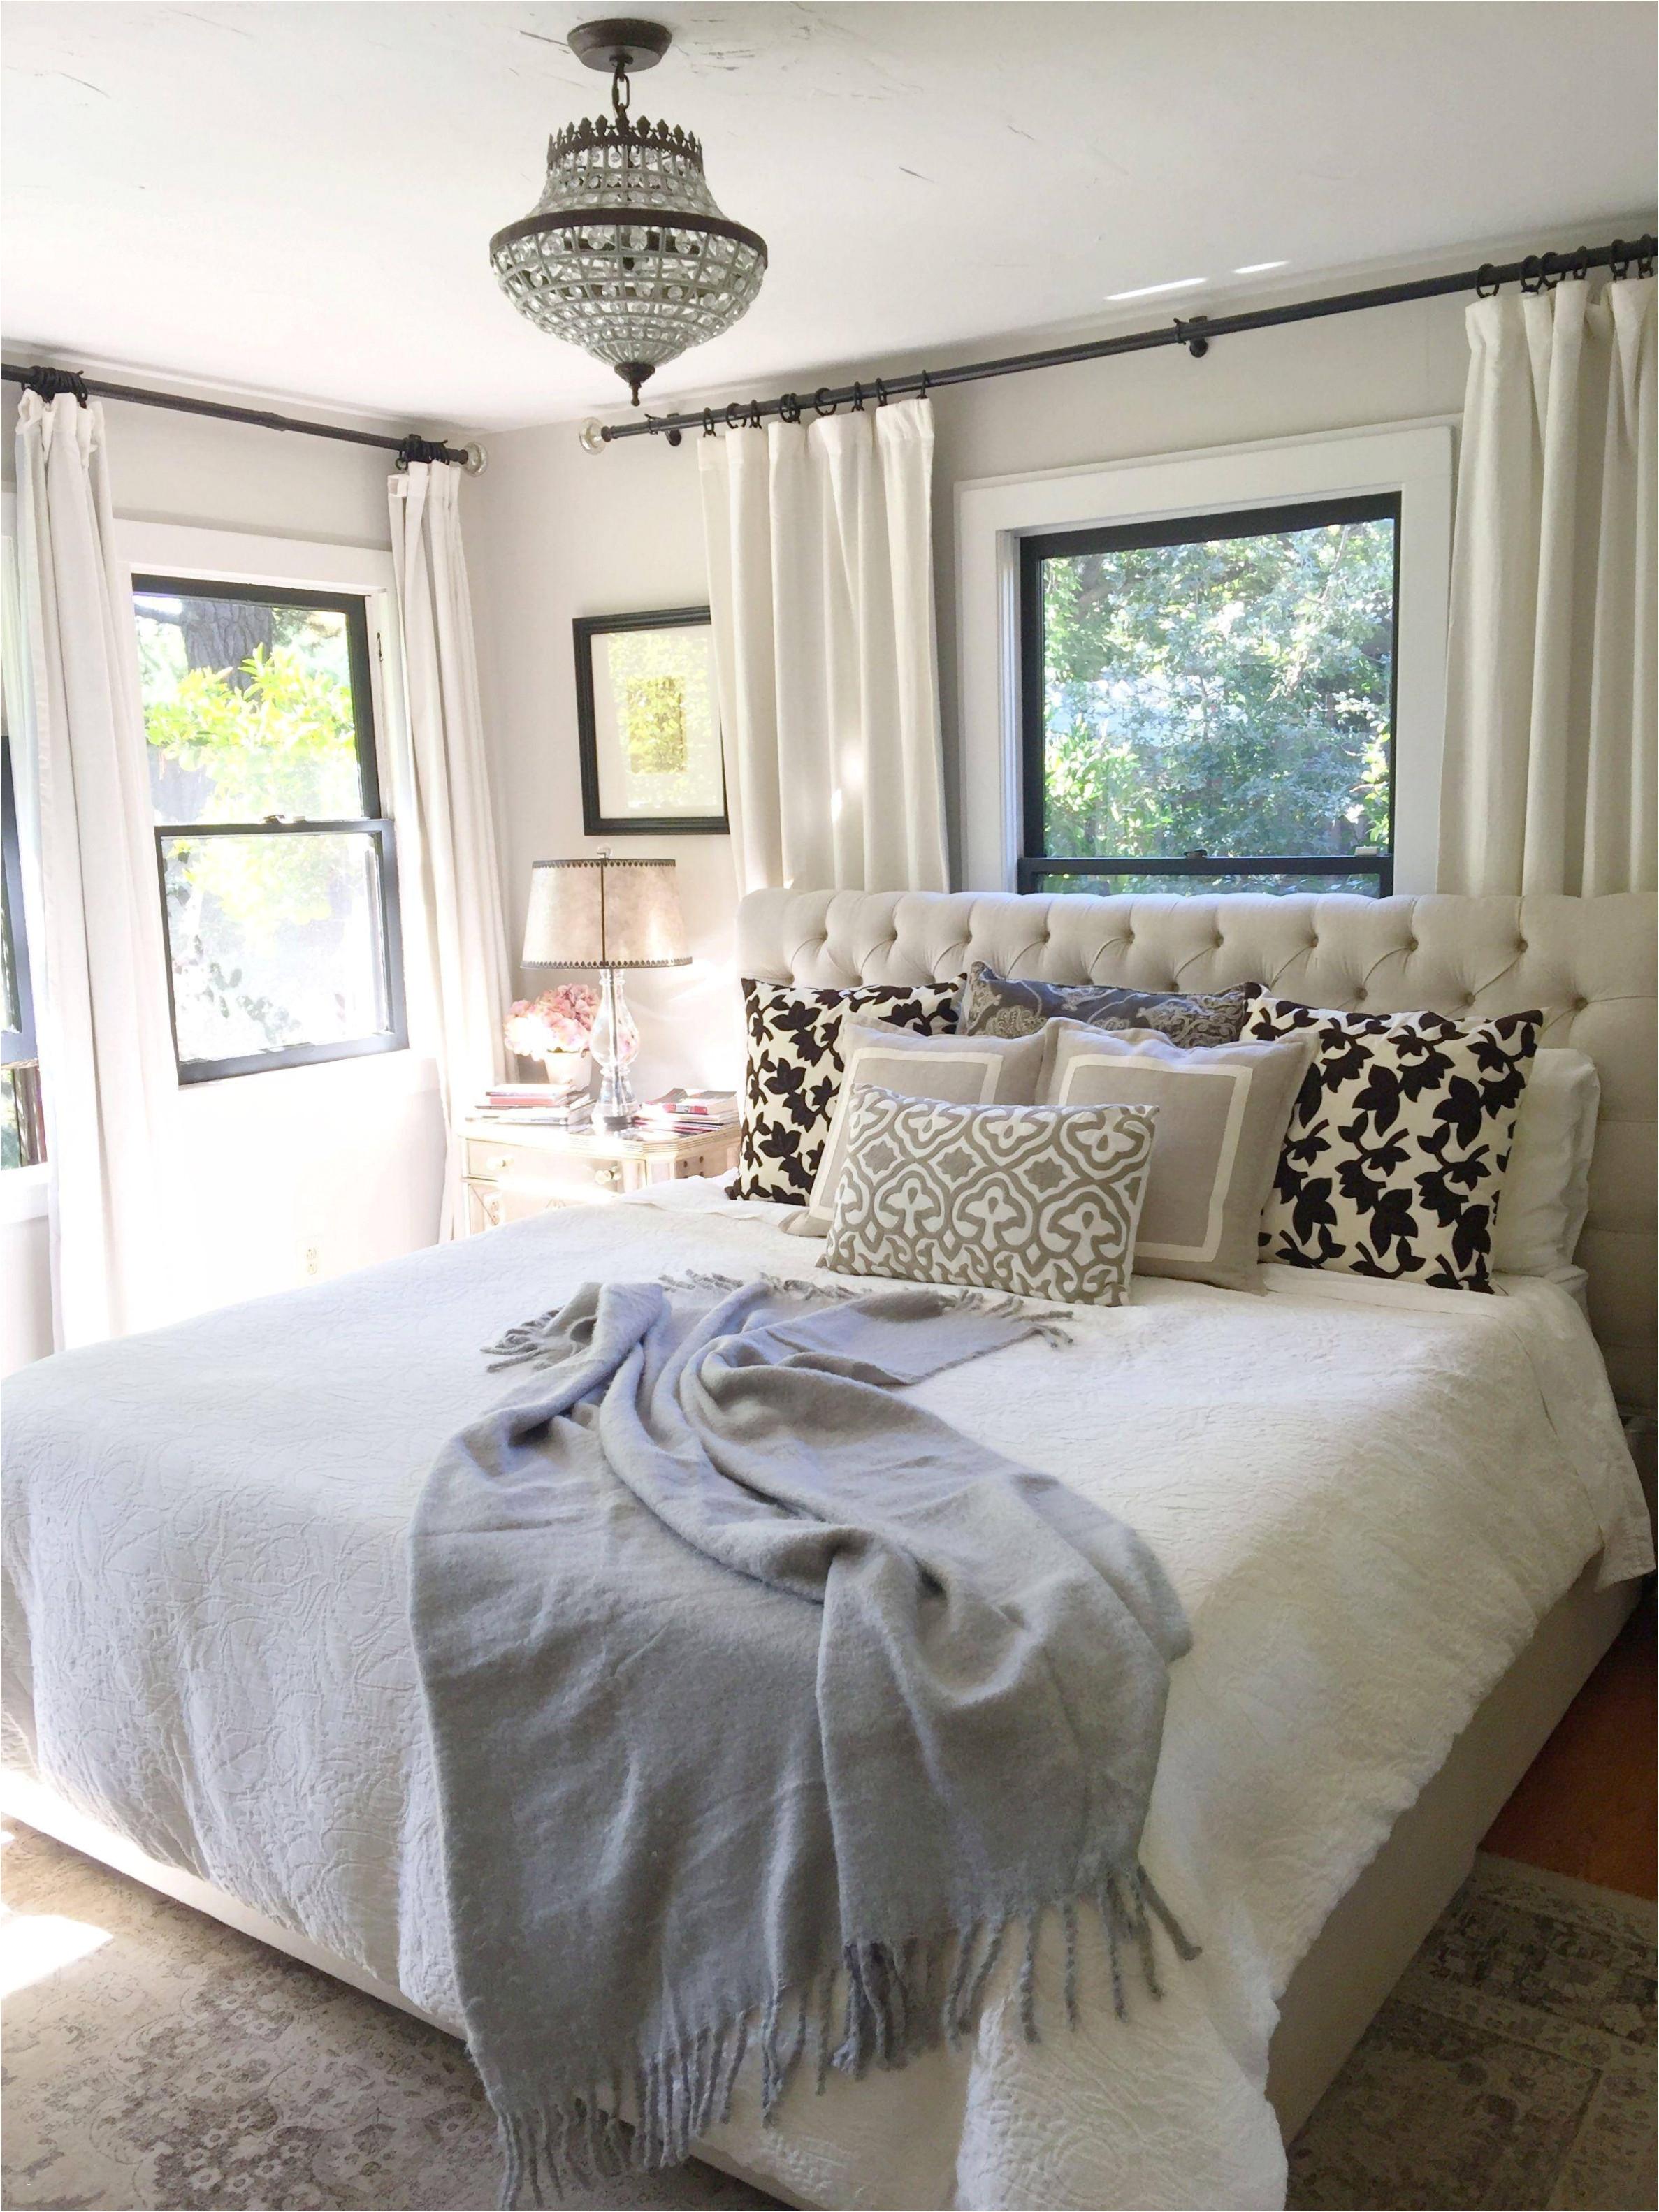 Terrific Bedroom Ideas Ikea Kids Rooms Awesome Wall Bookshelf 0d